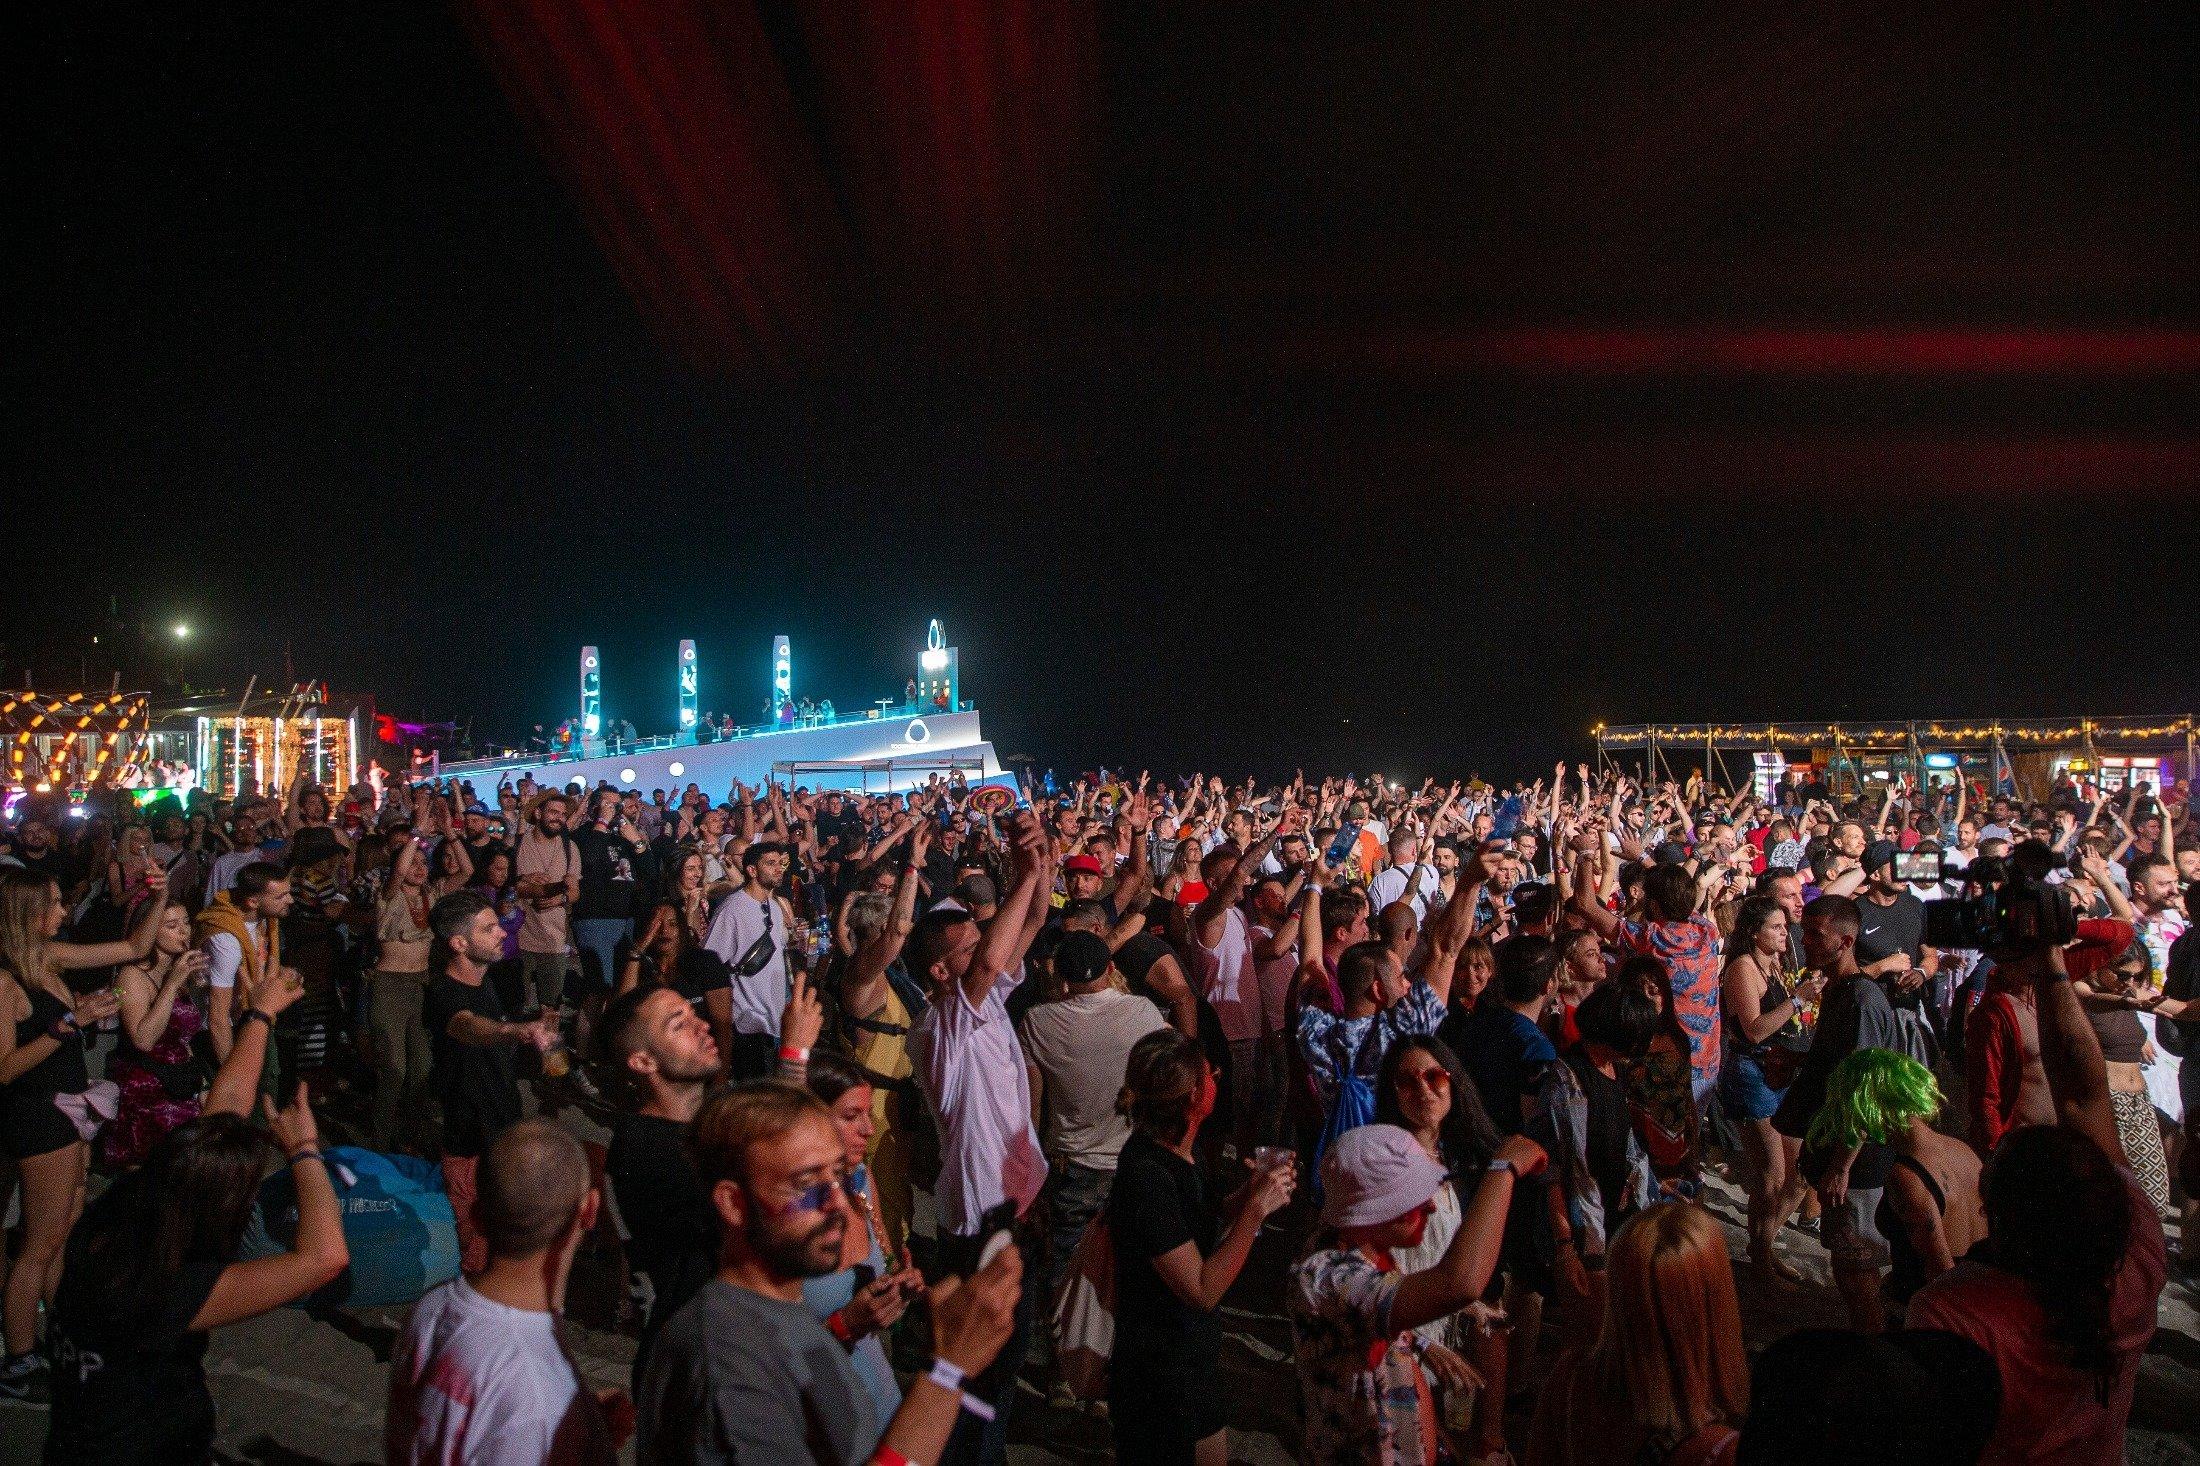 Thousands of coronavirus-free international fans participate at Unum Albania's open-air music festival in Shengjin, Albania, June 4, 2021. (AP Photo)